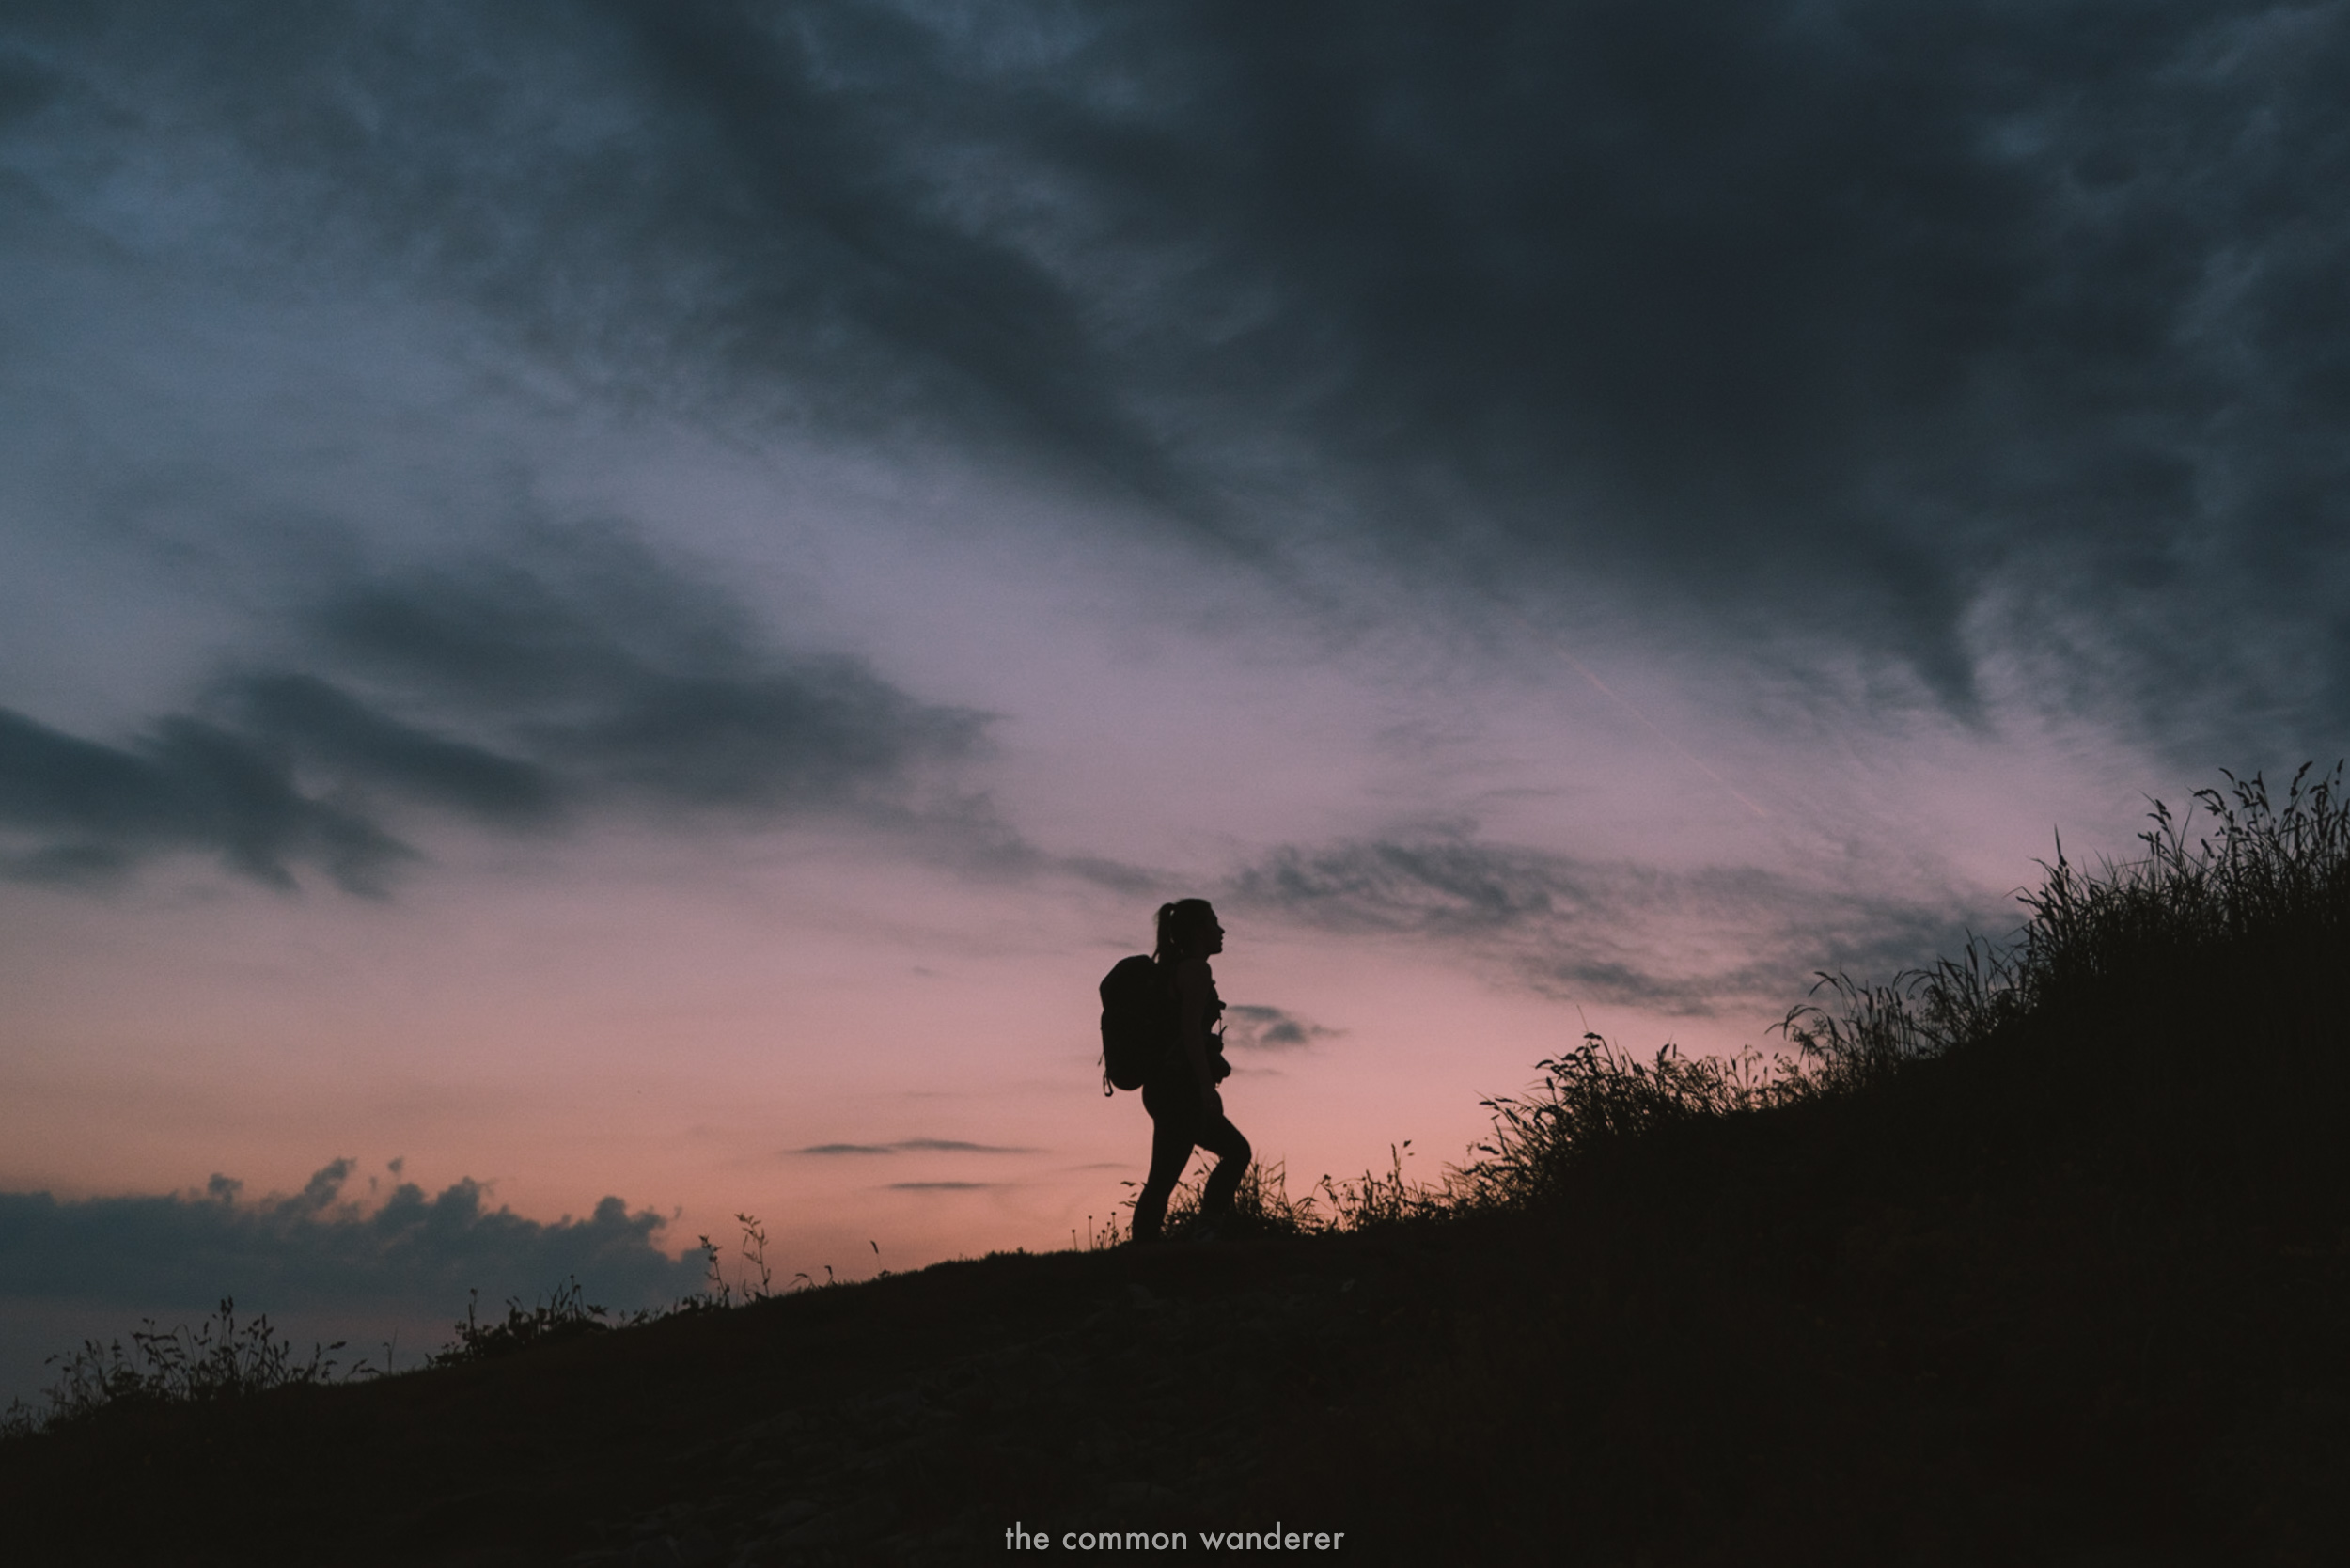 sunrise hike to kanisfluh mountain, vorarlberg